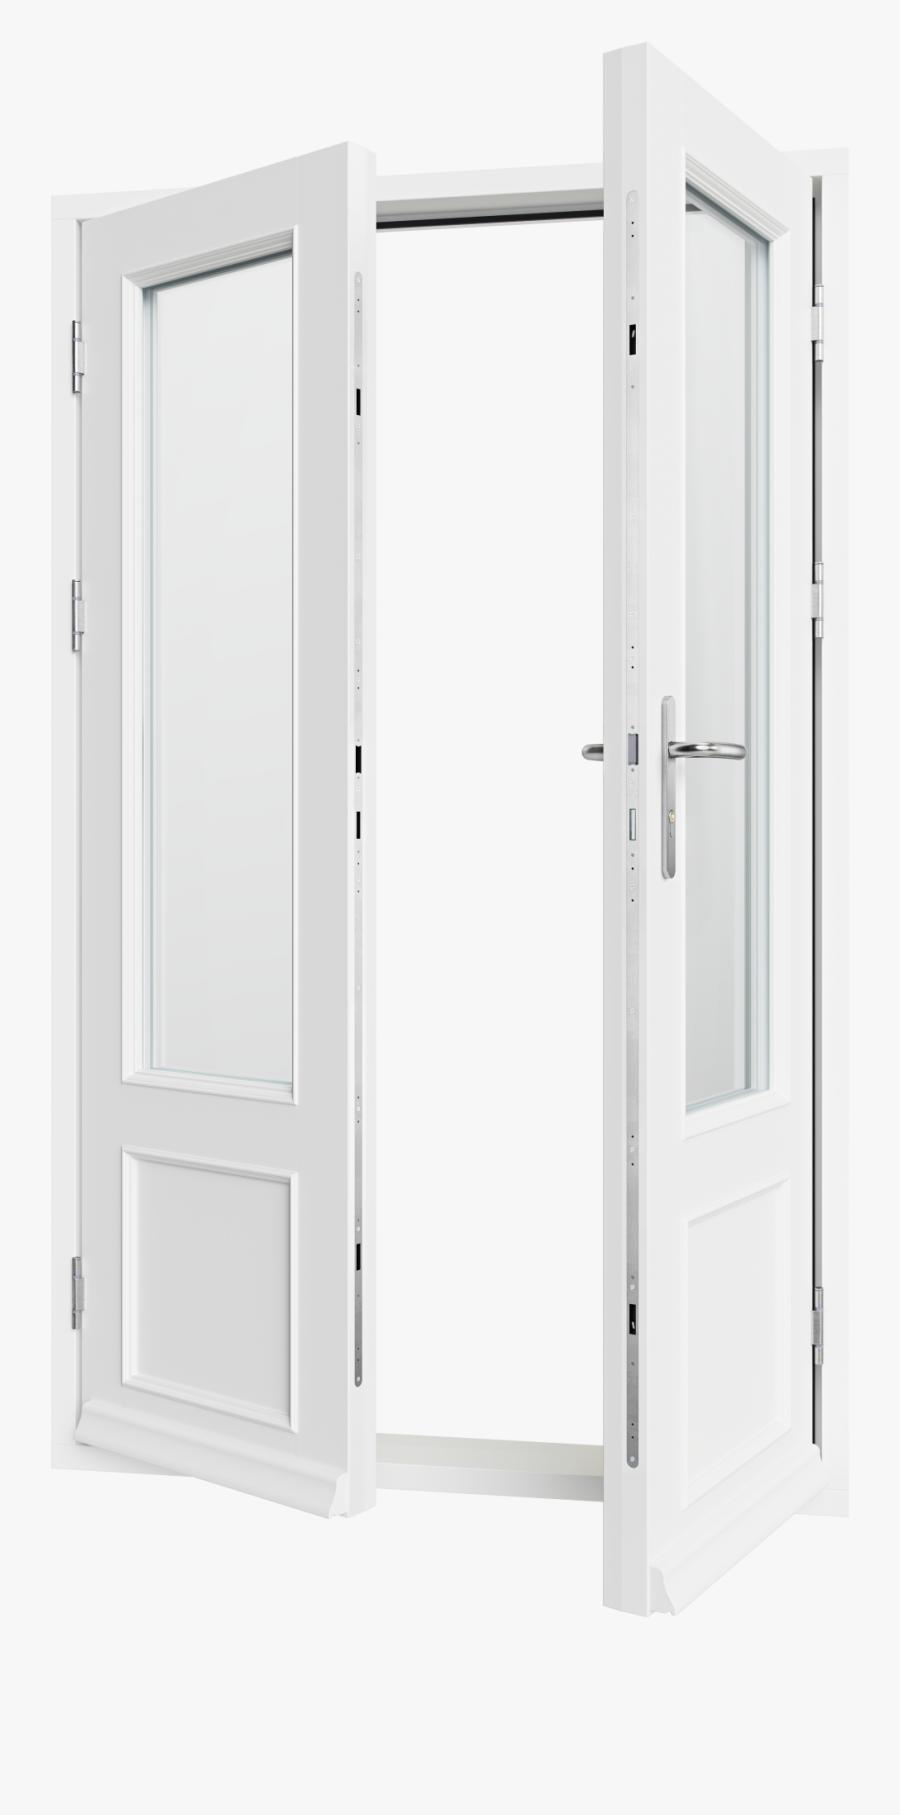 Timber Doors Schnauber - Victorian Terrace House French Doors, Transparent Clipart